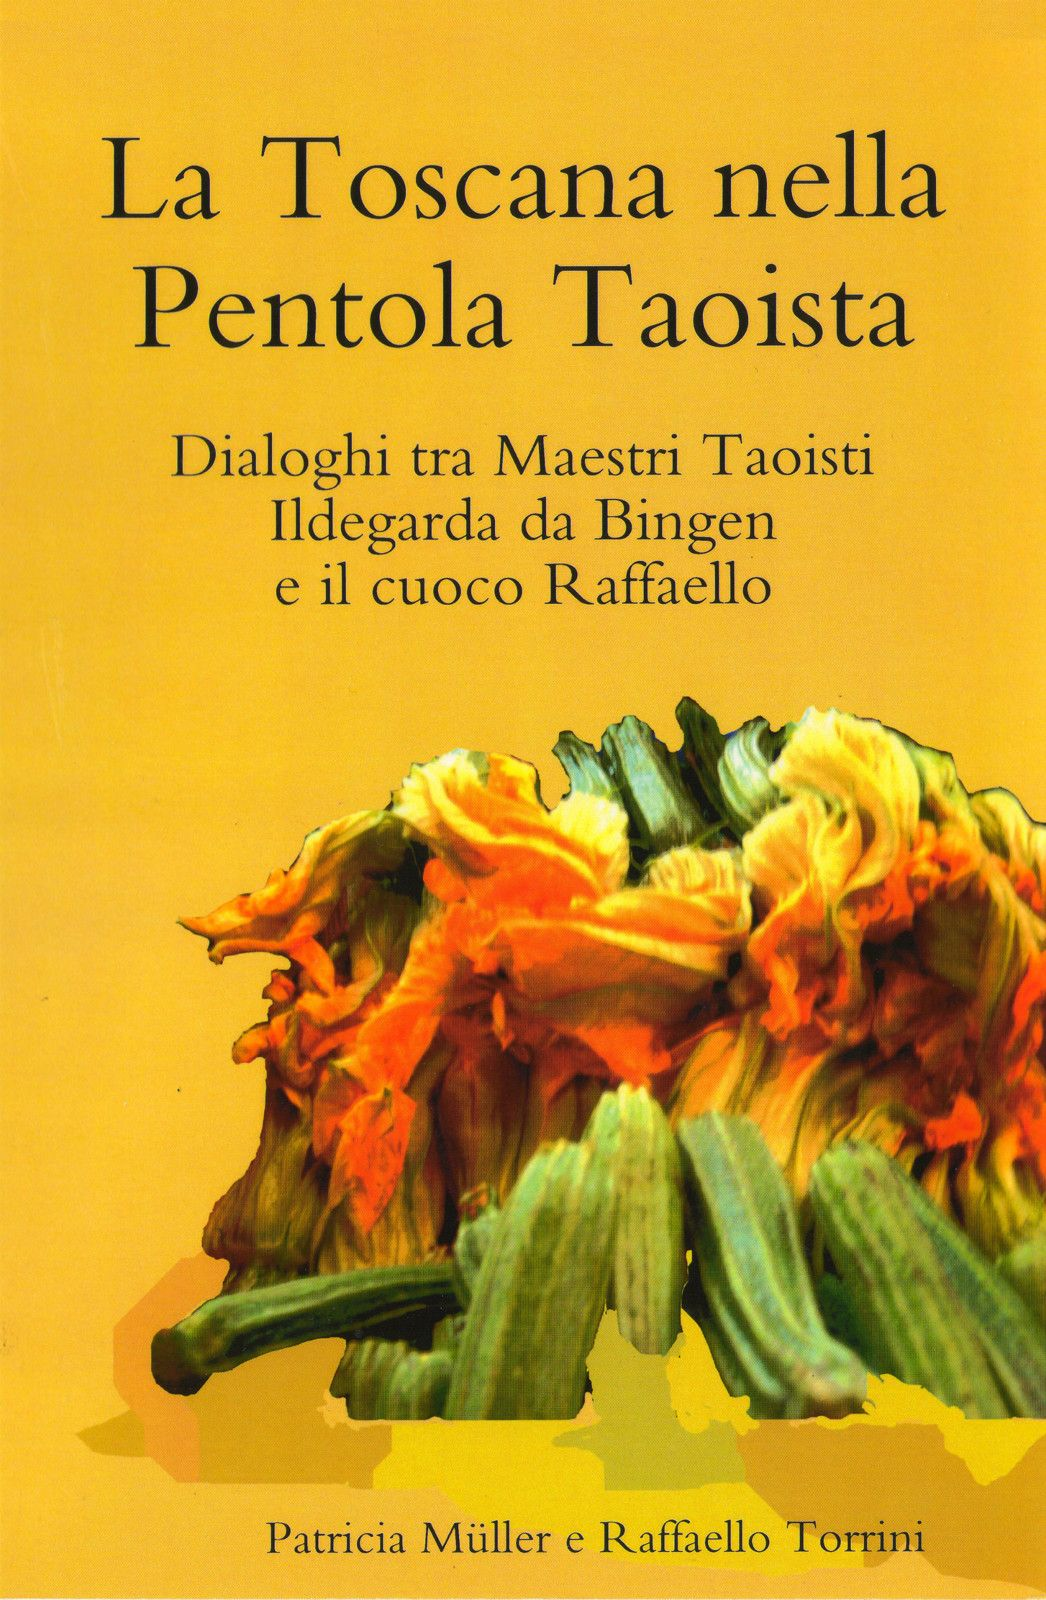 La Toscana nella Pentola Taoista - Kindle Mobi